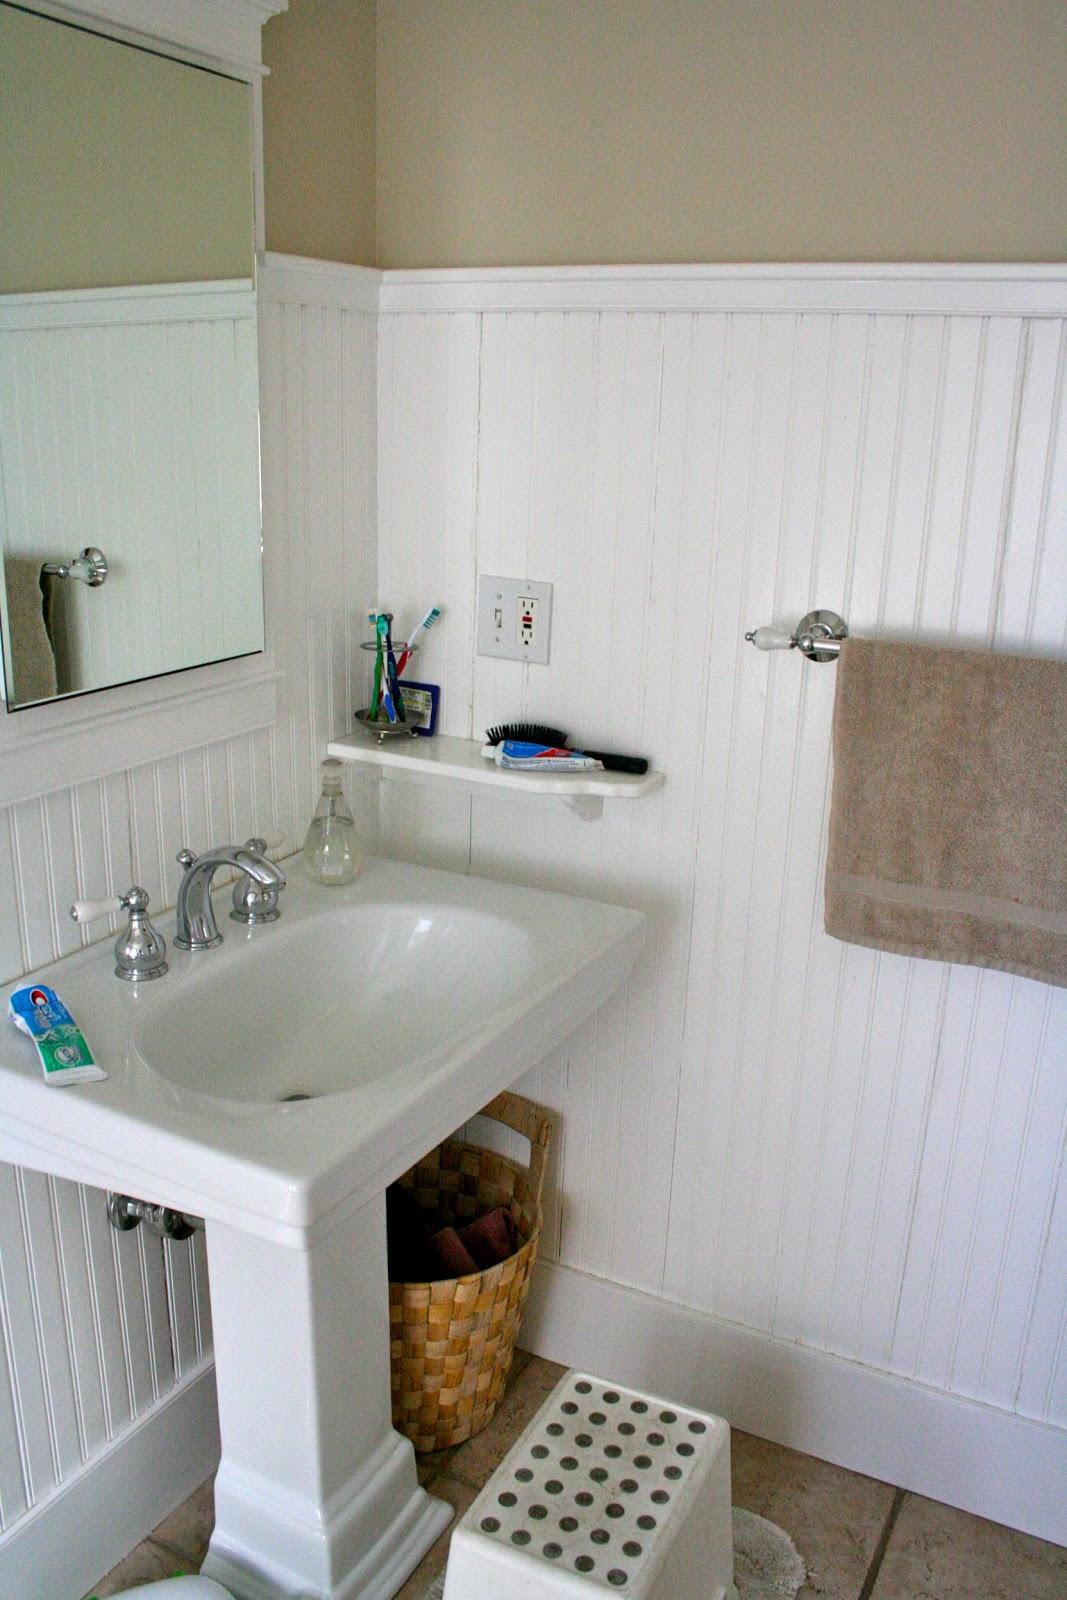 Hurst Street: Bathroom Renovation, Step 1